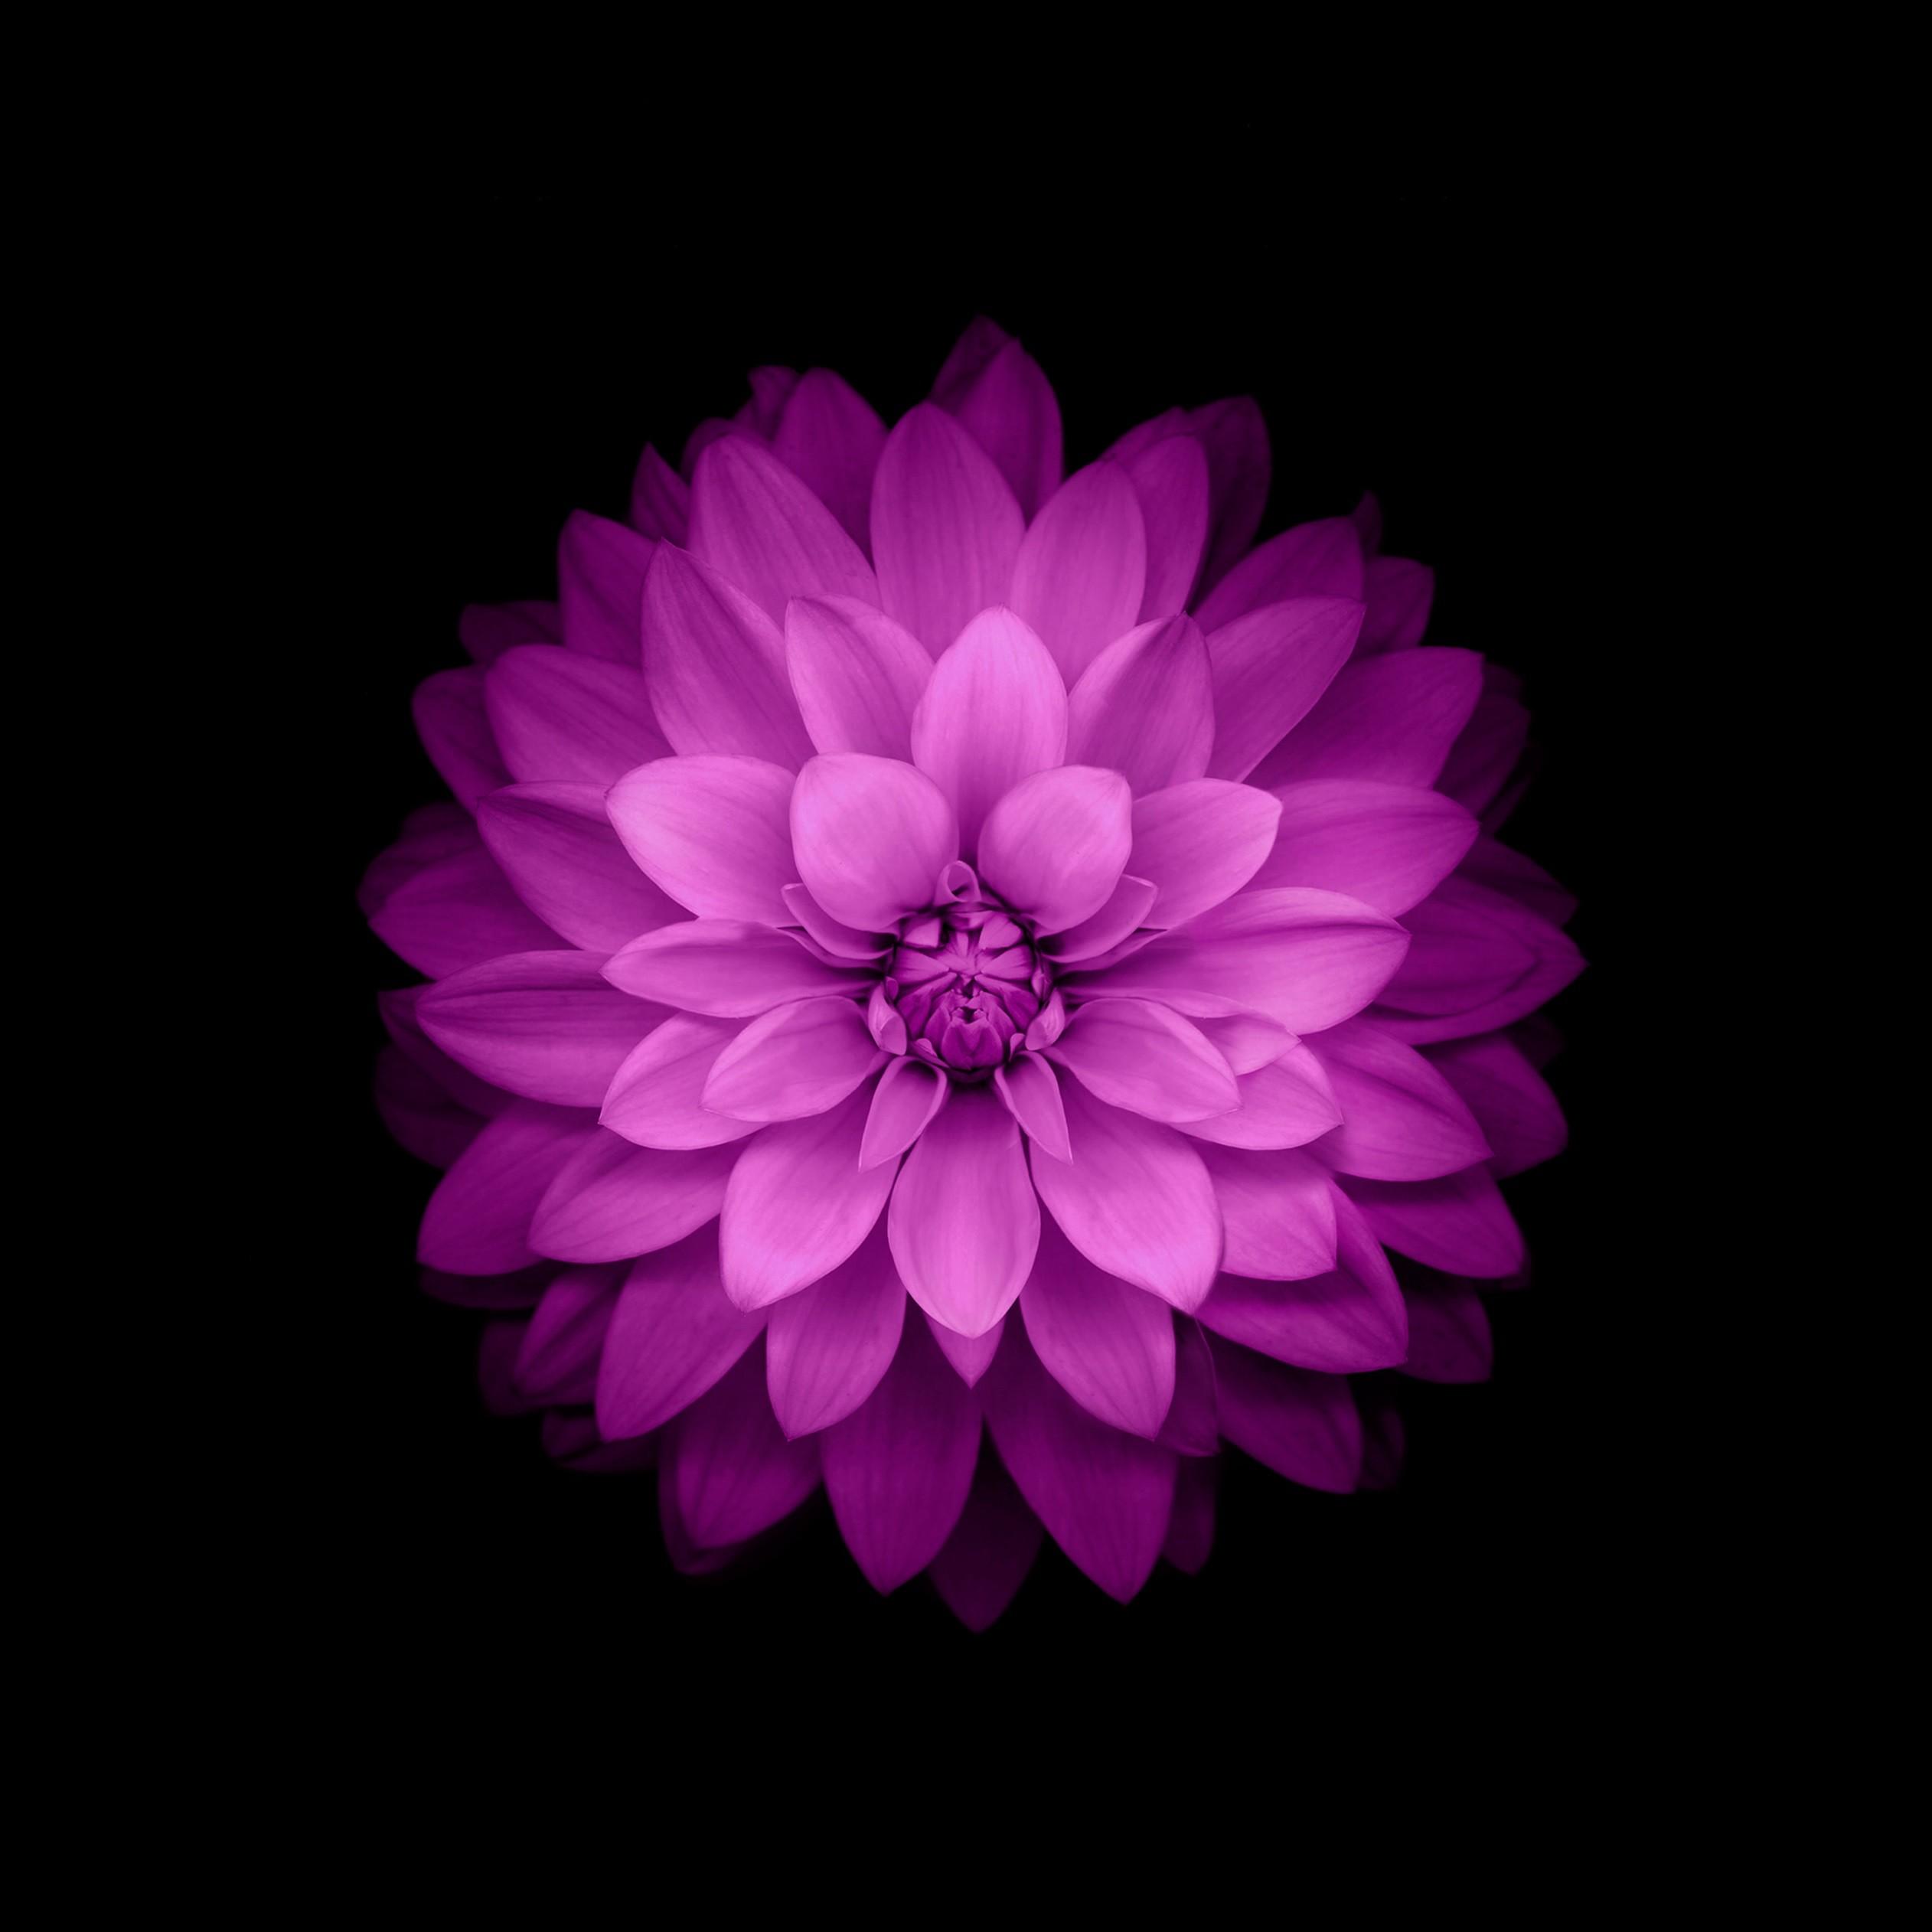 Wallpaper Digital Art Plants Violet Circle Pink Purple